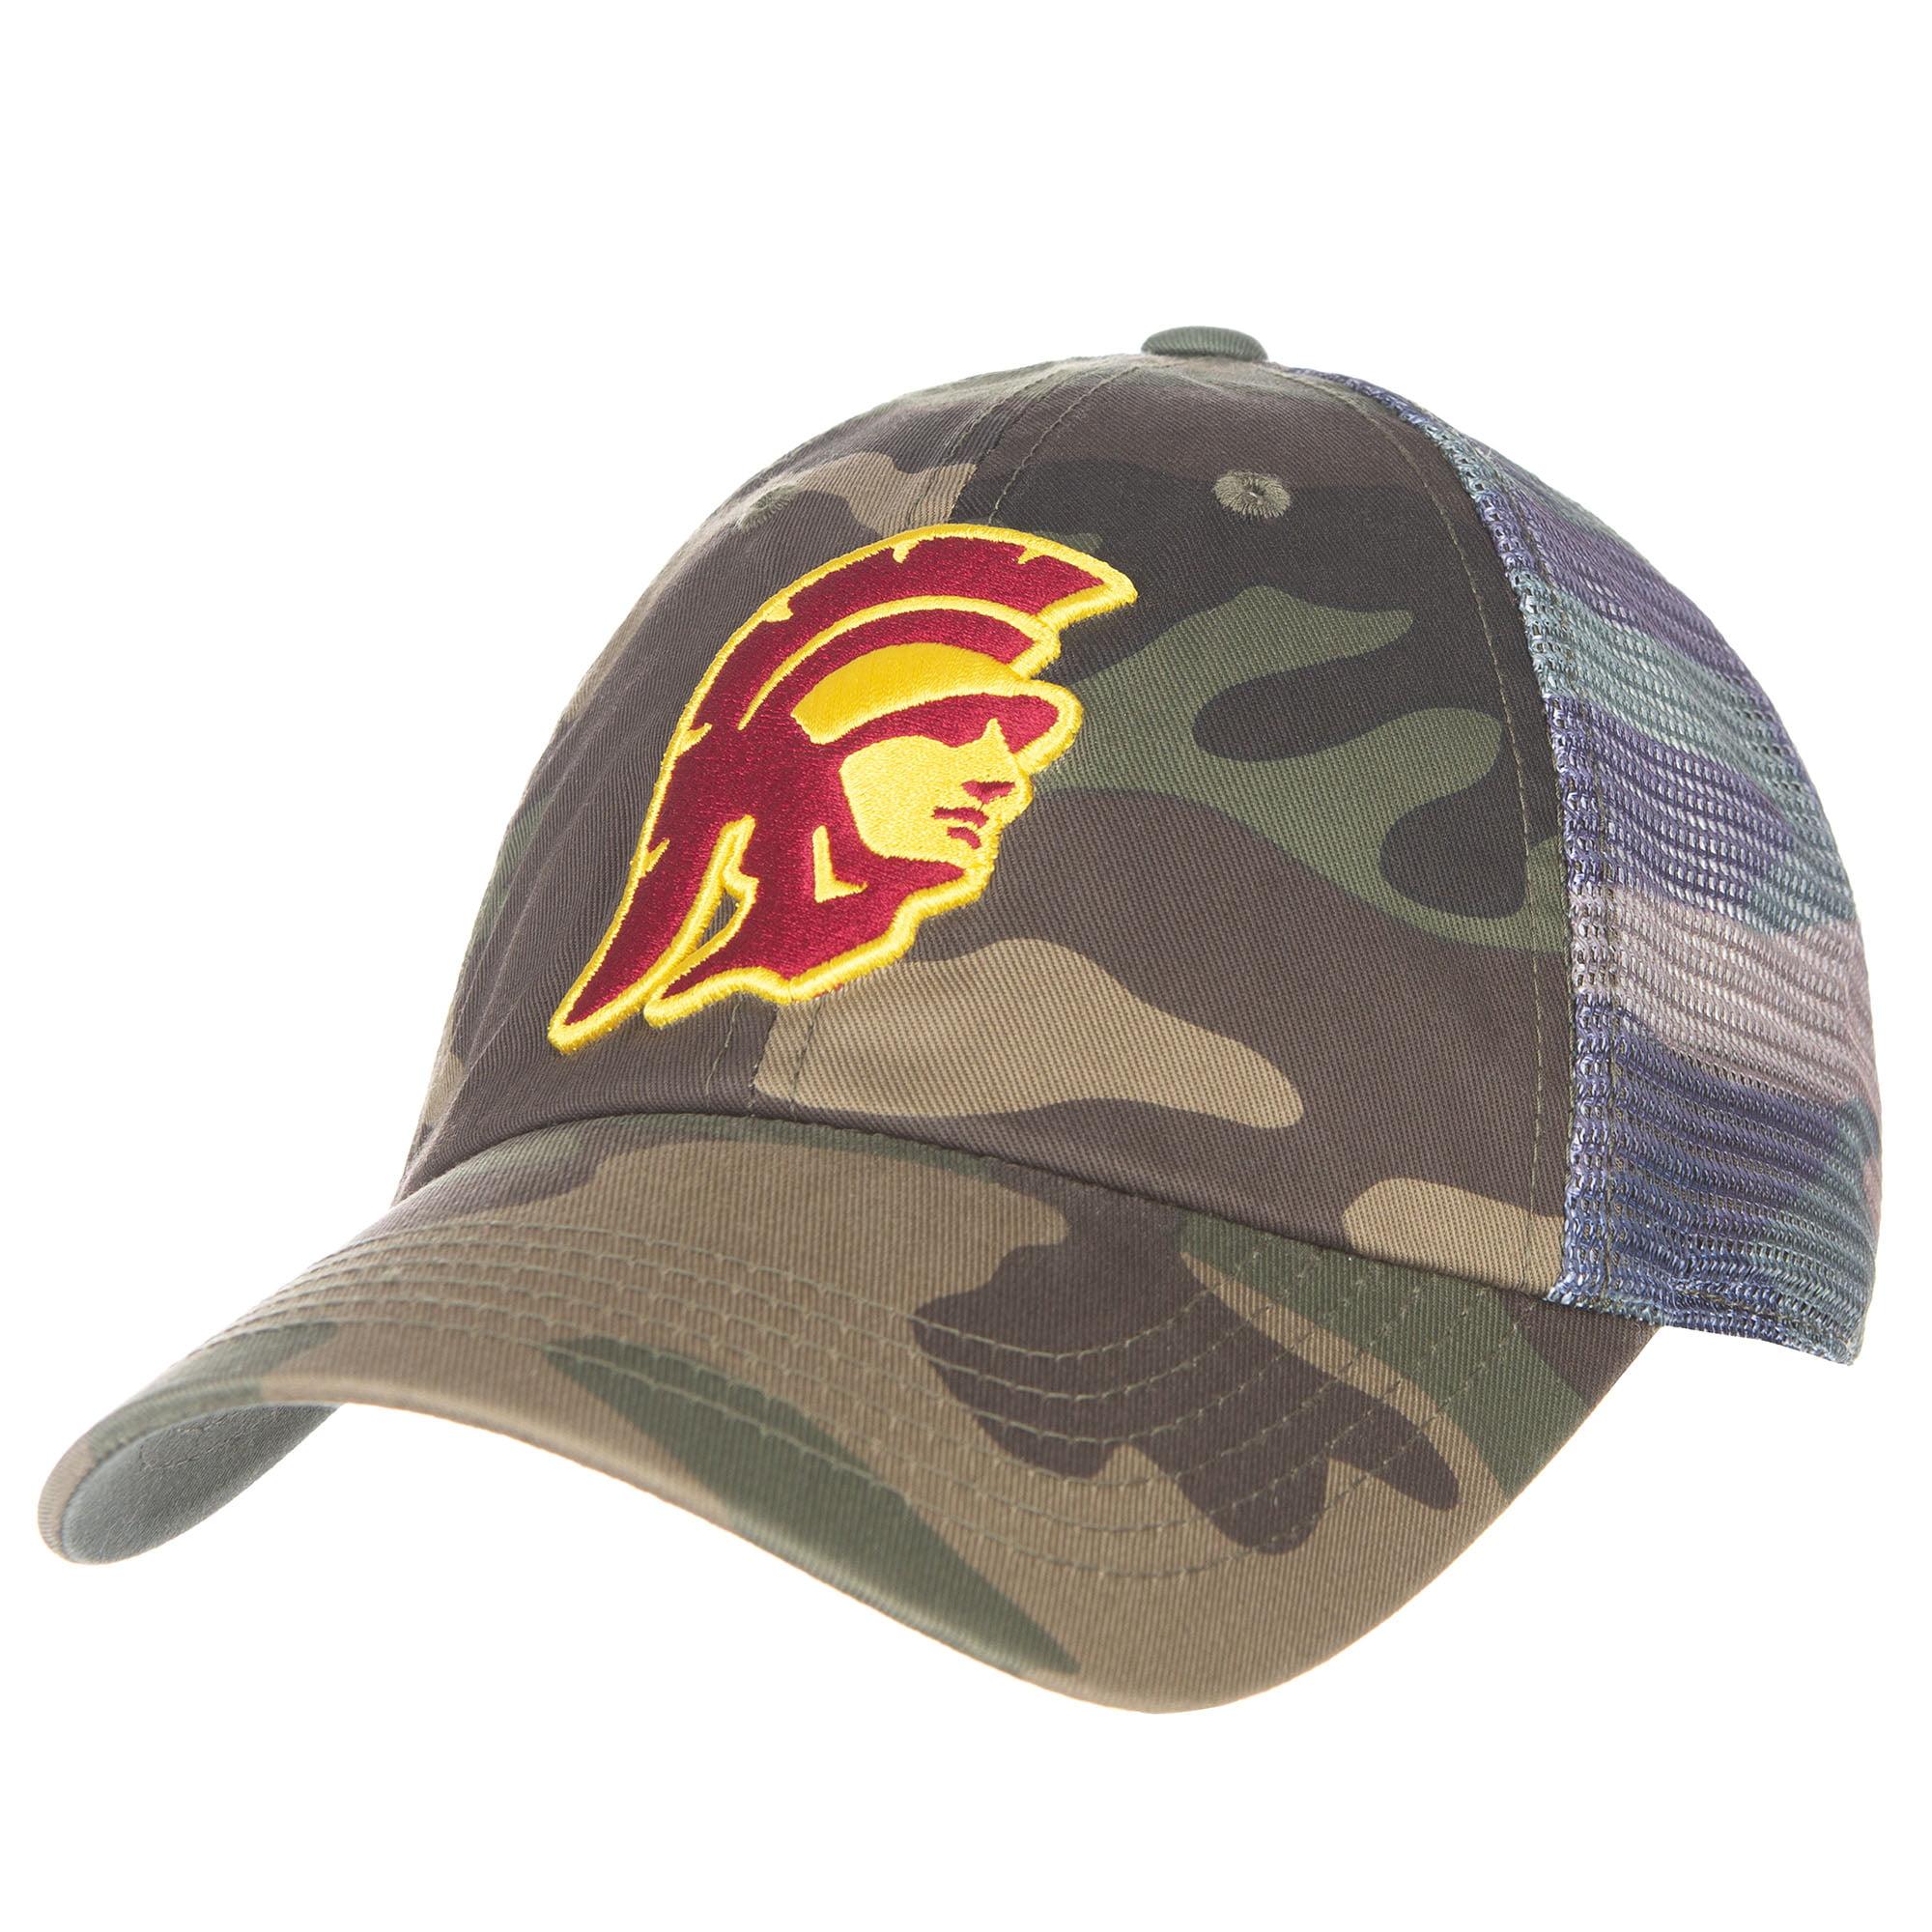 Men's Camo USC Trojans Cambletown Adjustable Snapback Hat - OSFA